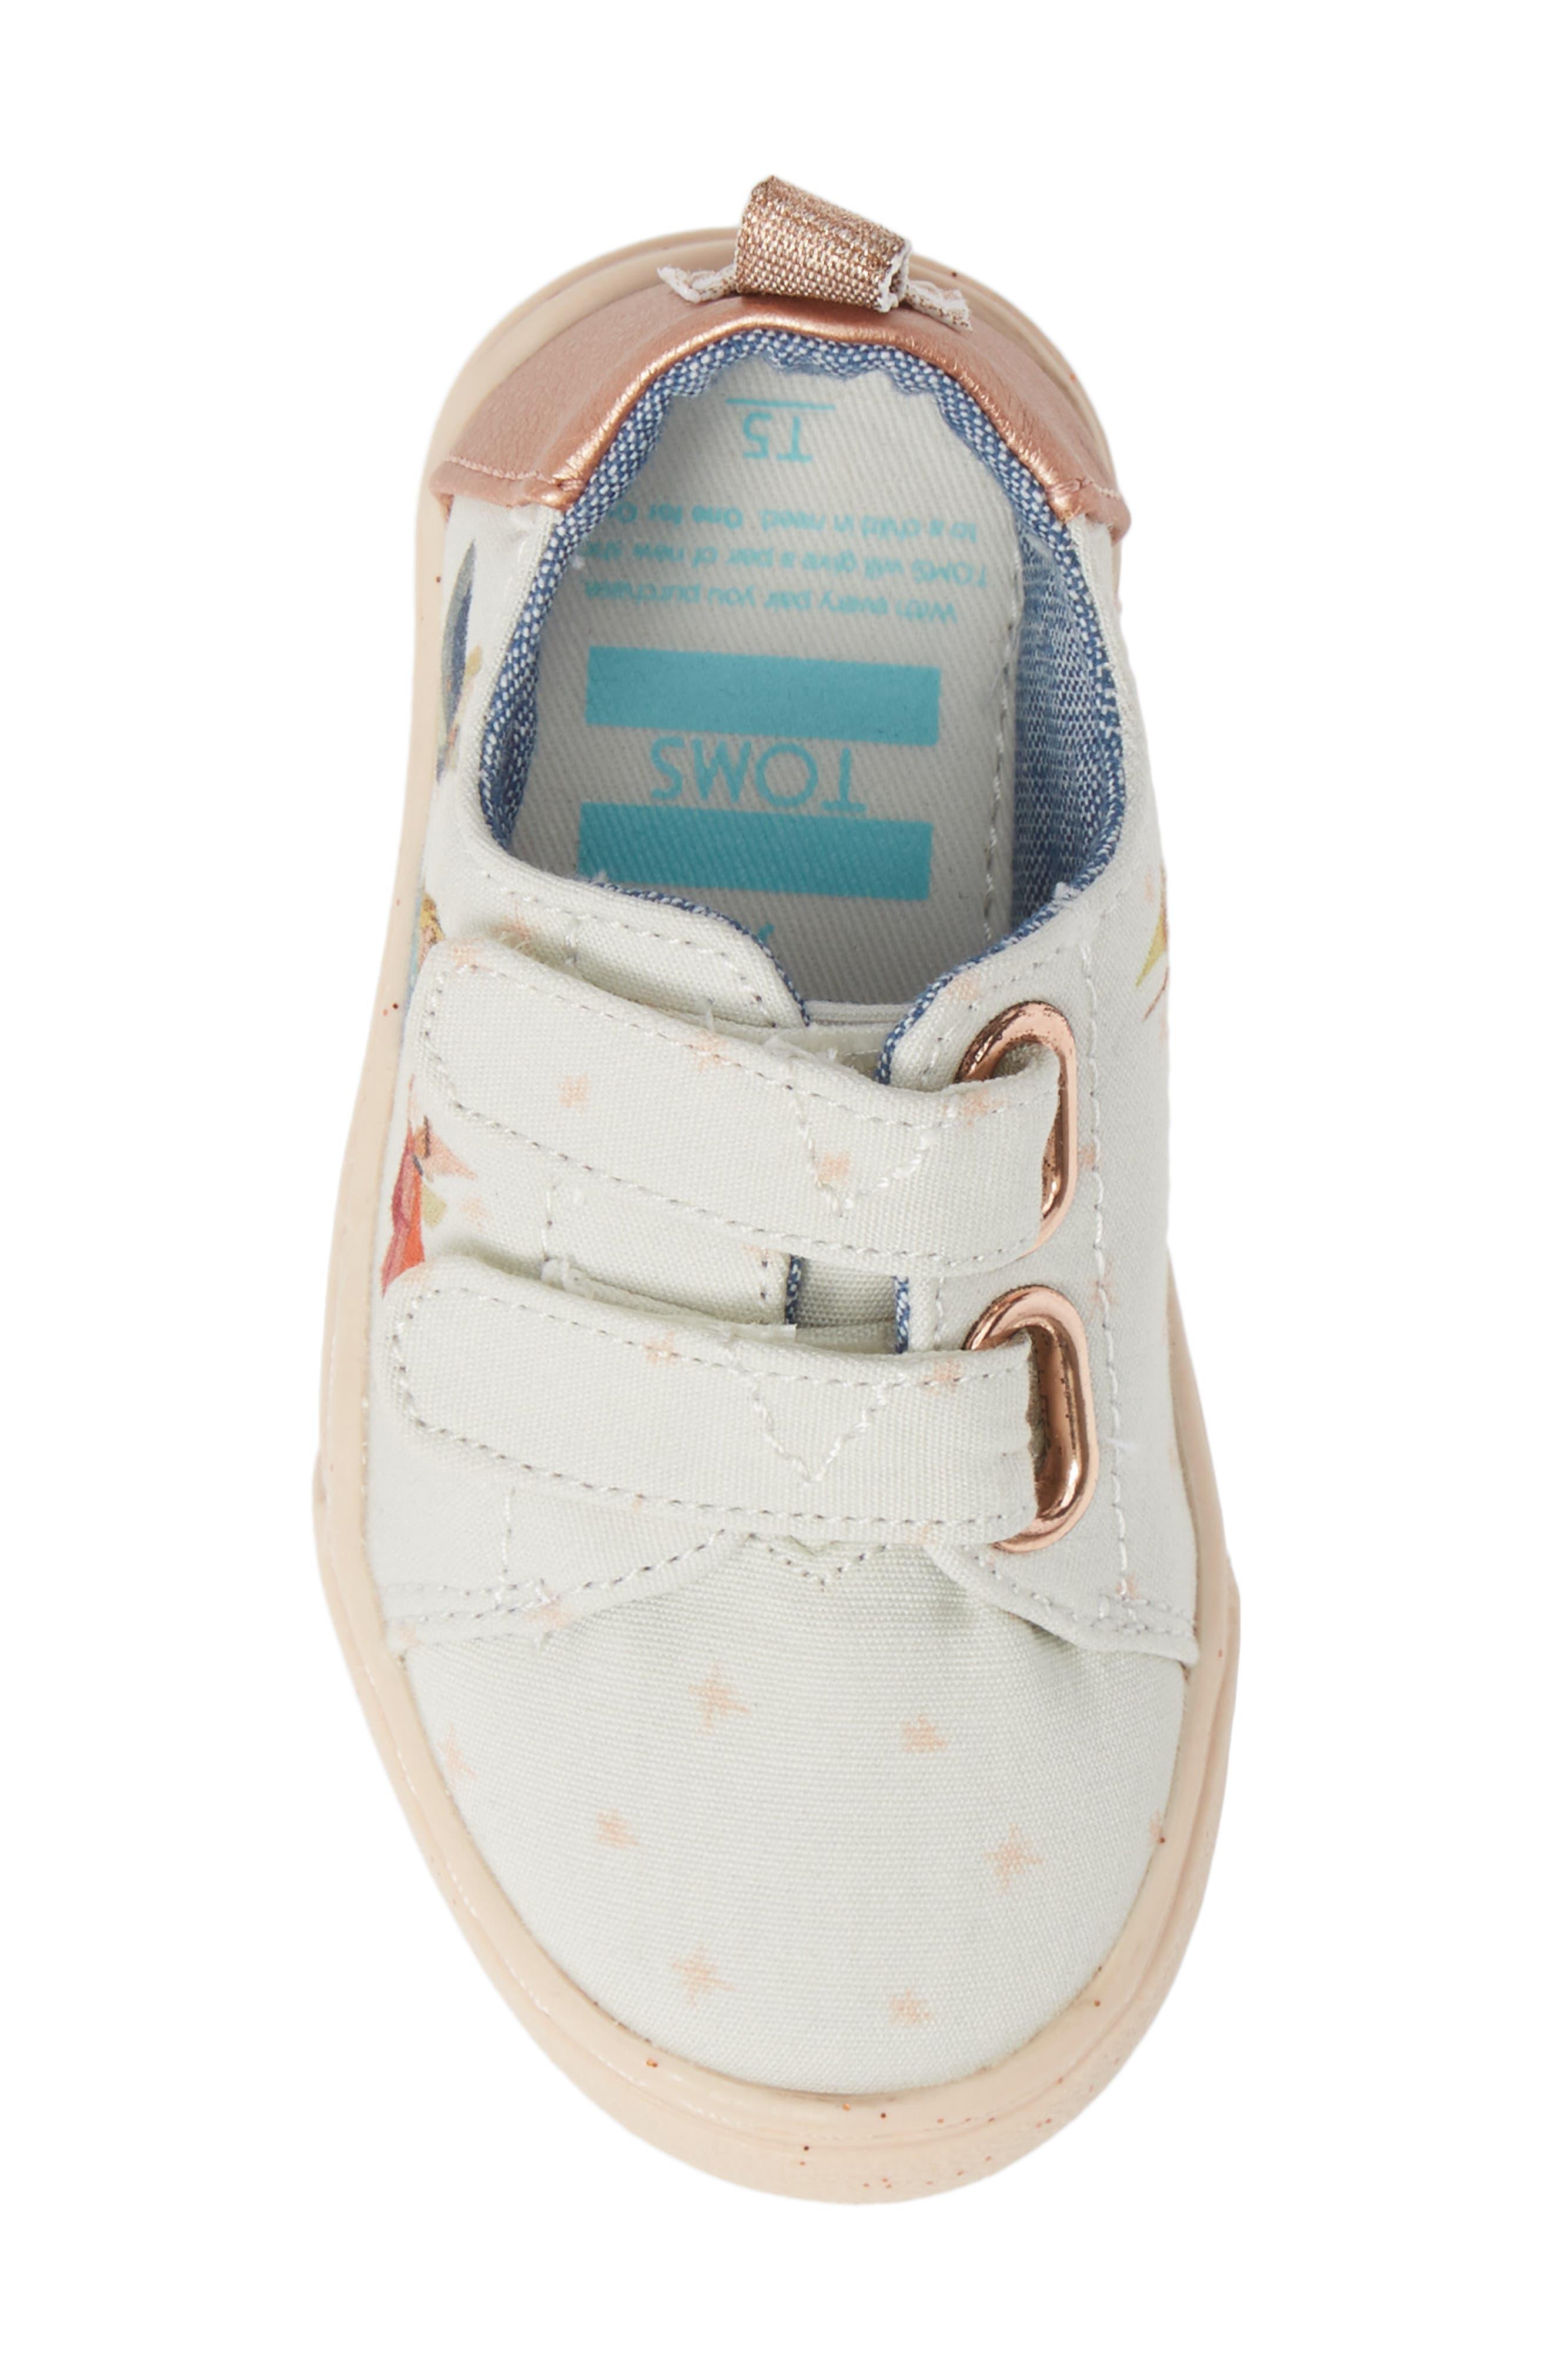 x Disney Tiny Lenny Sneaker,                             Alternate thumbnail 5, color,                             900